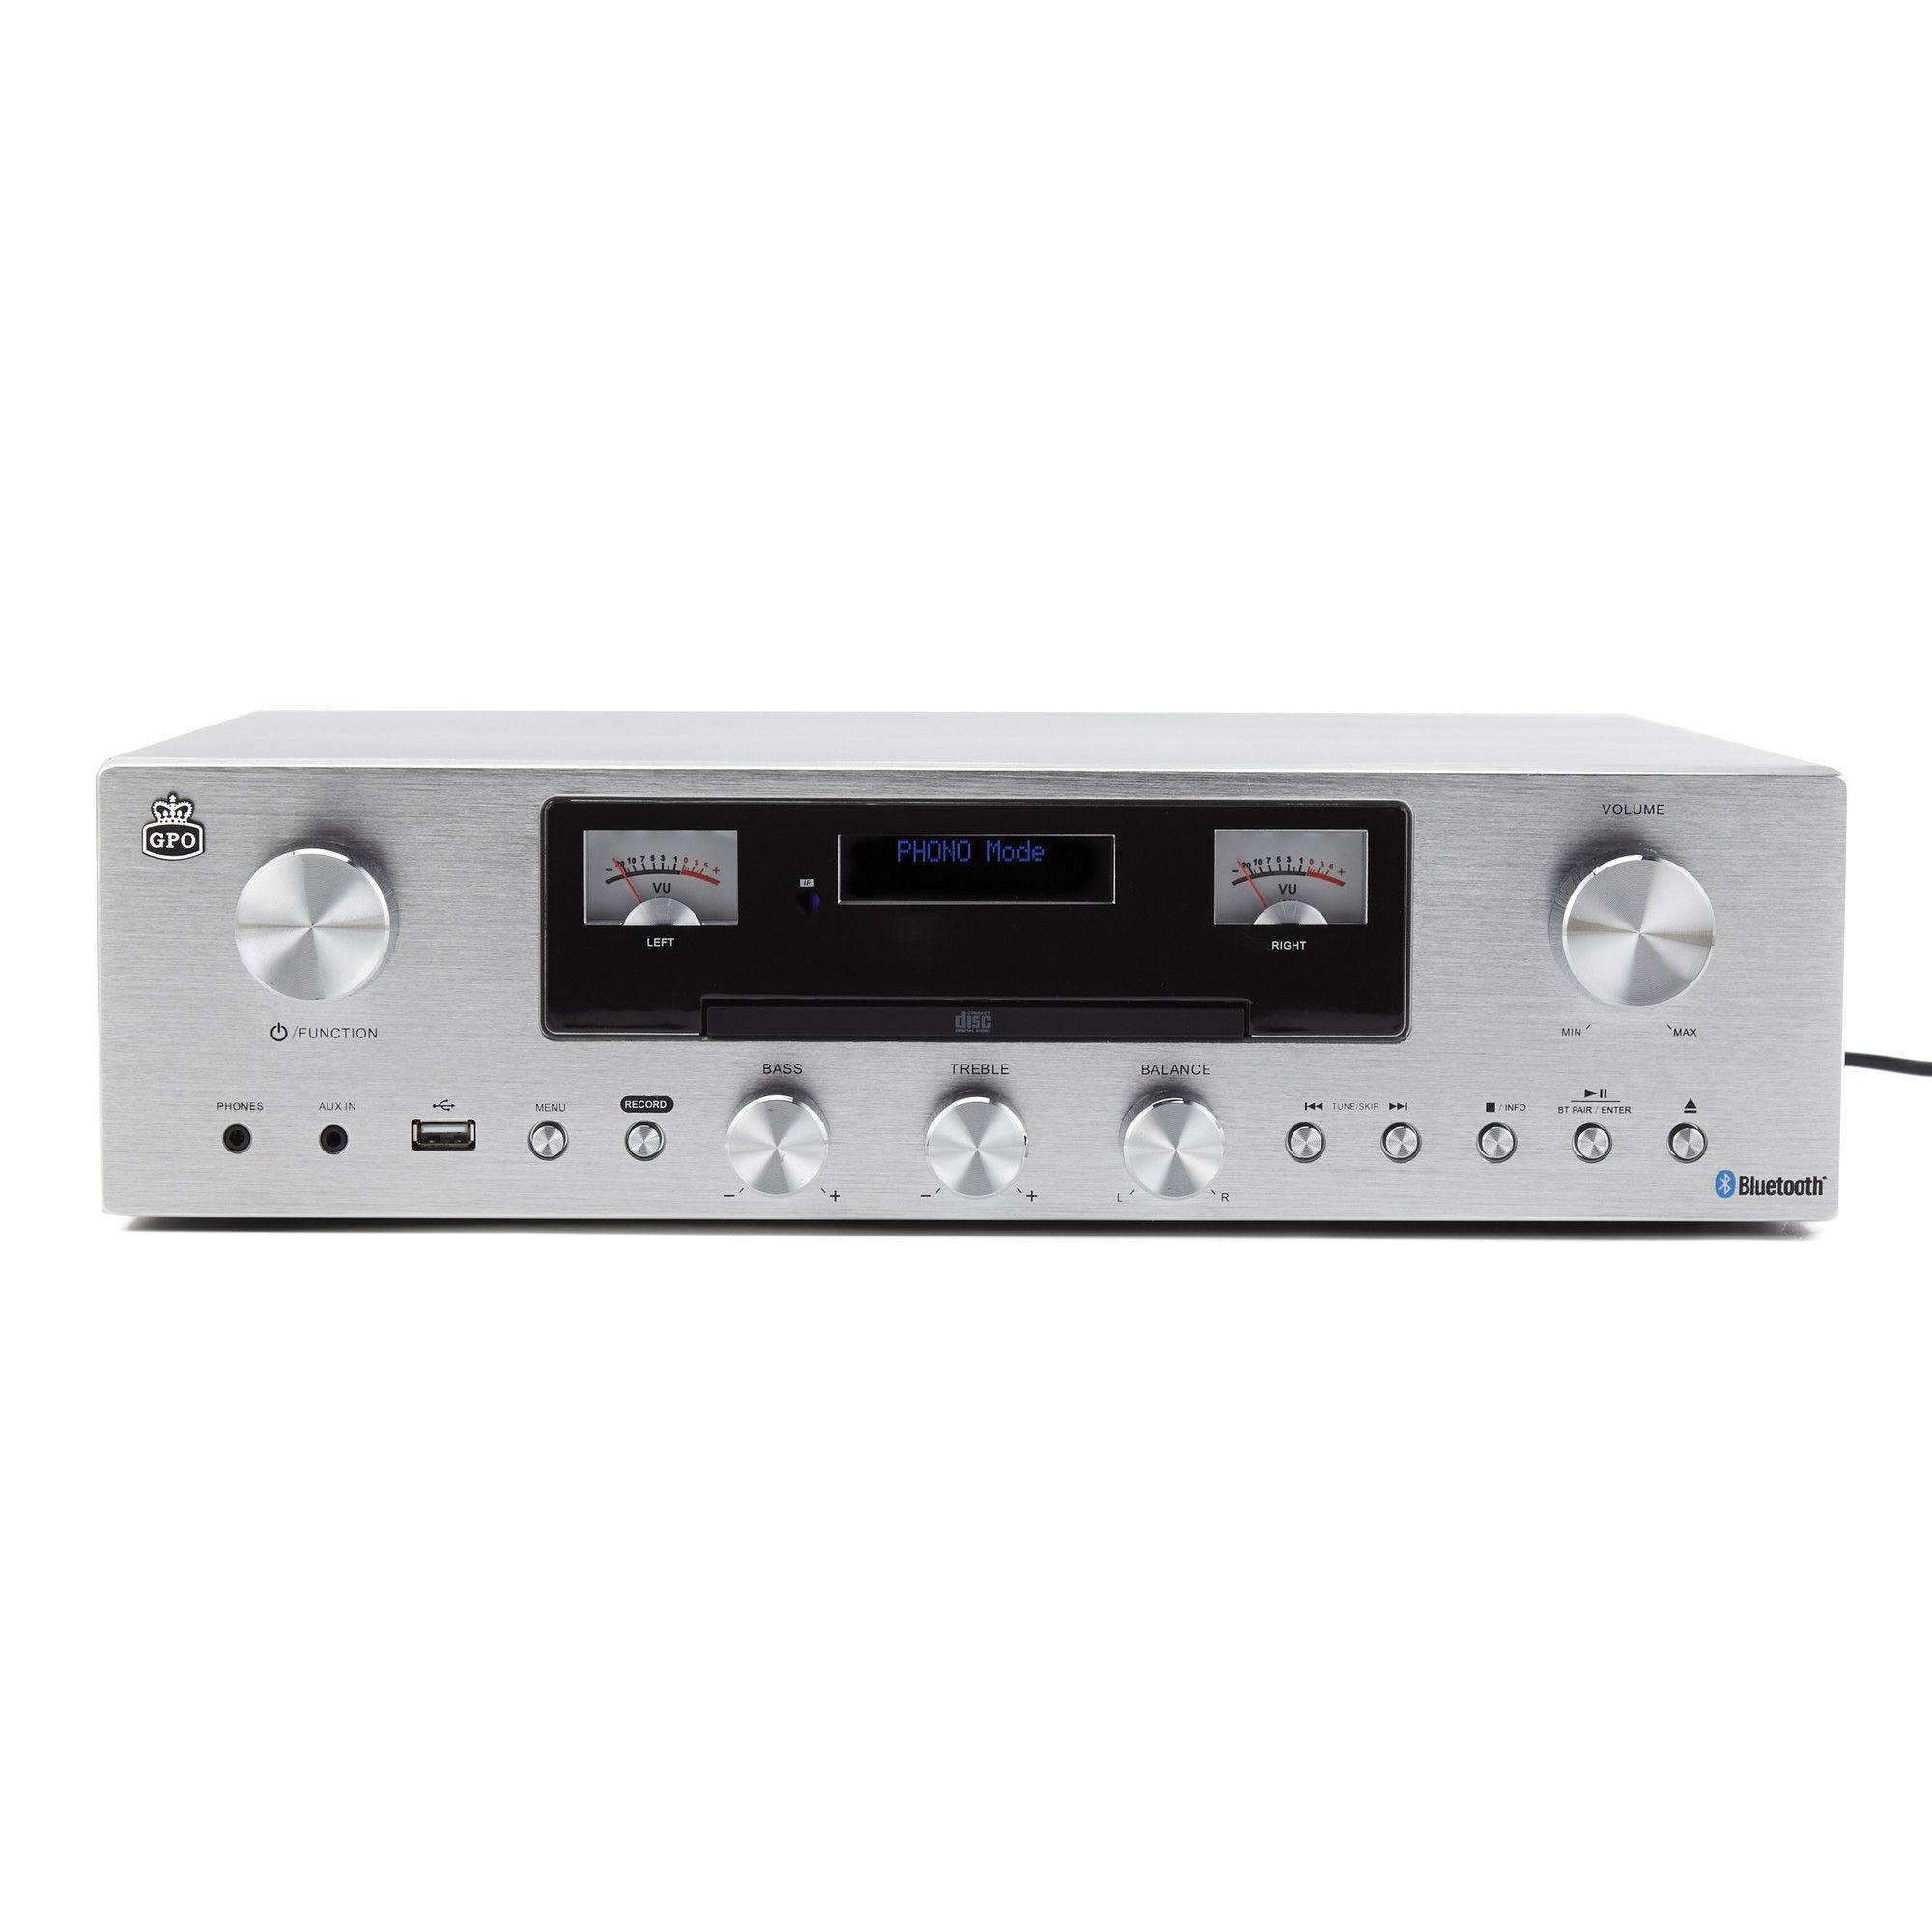 GPO PR200 Receiver - DAB+ radio, USB Bluetooth